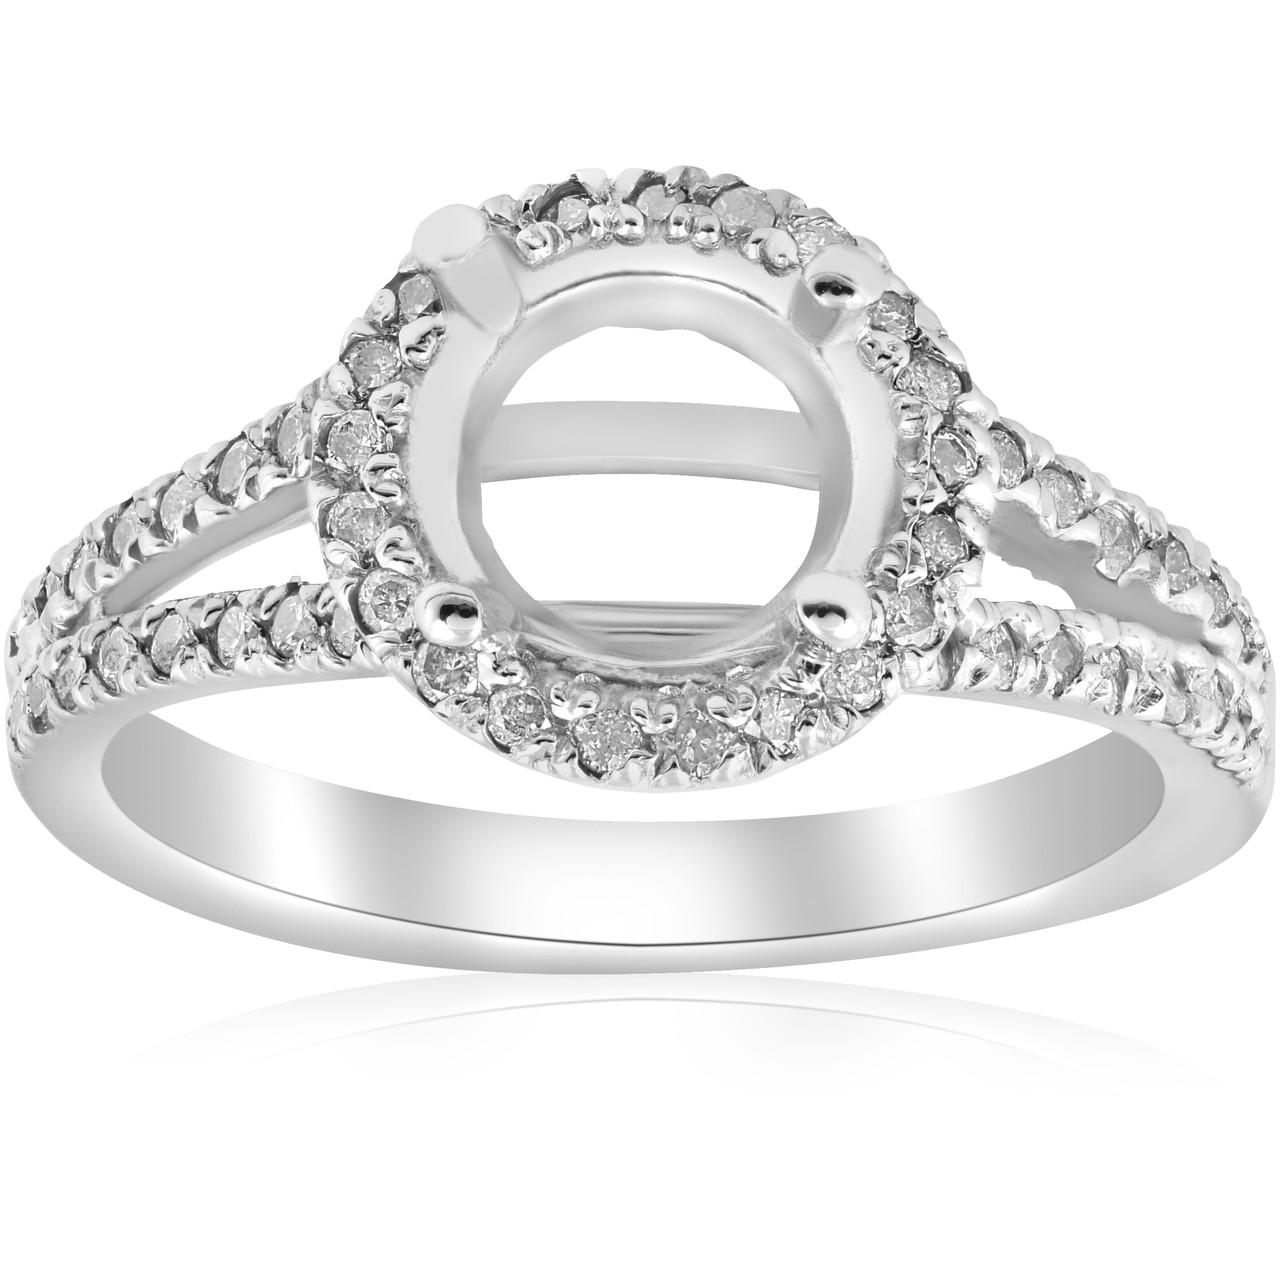 1/2ct Halo Split Shank Diamond Engagement Ring Setting 14k